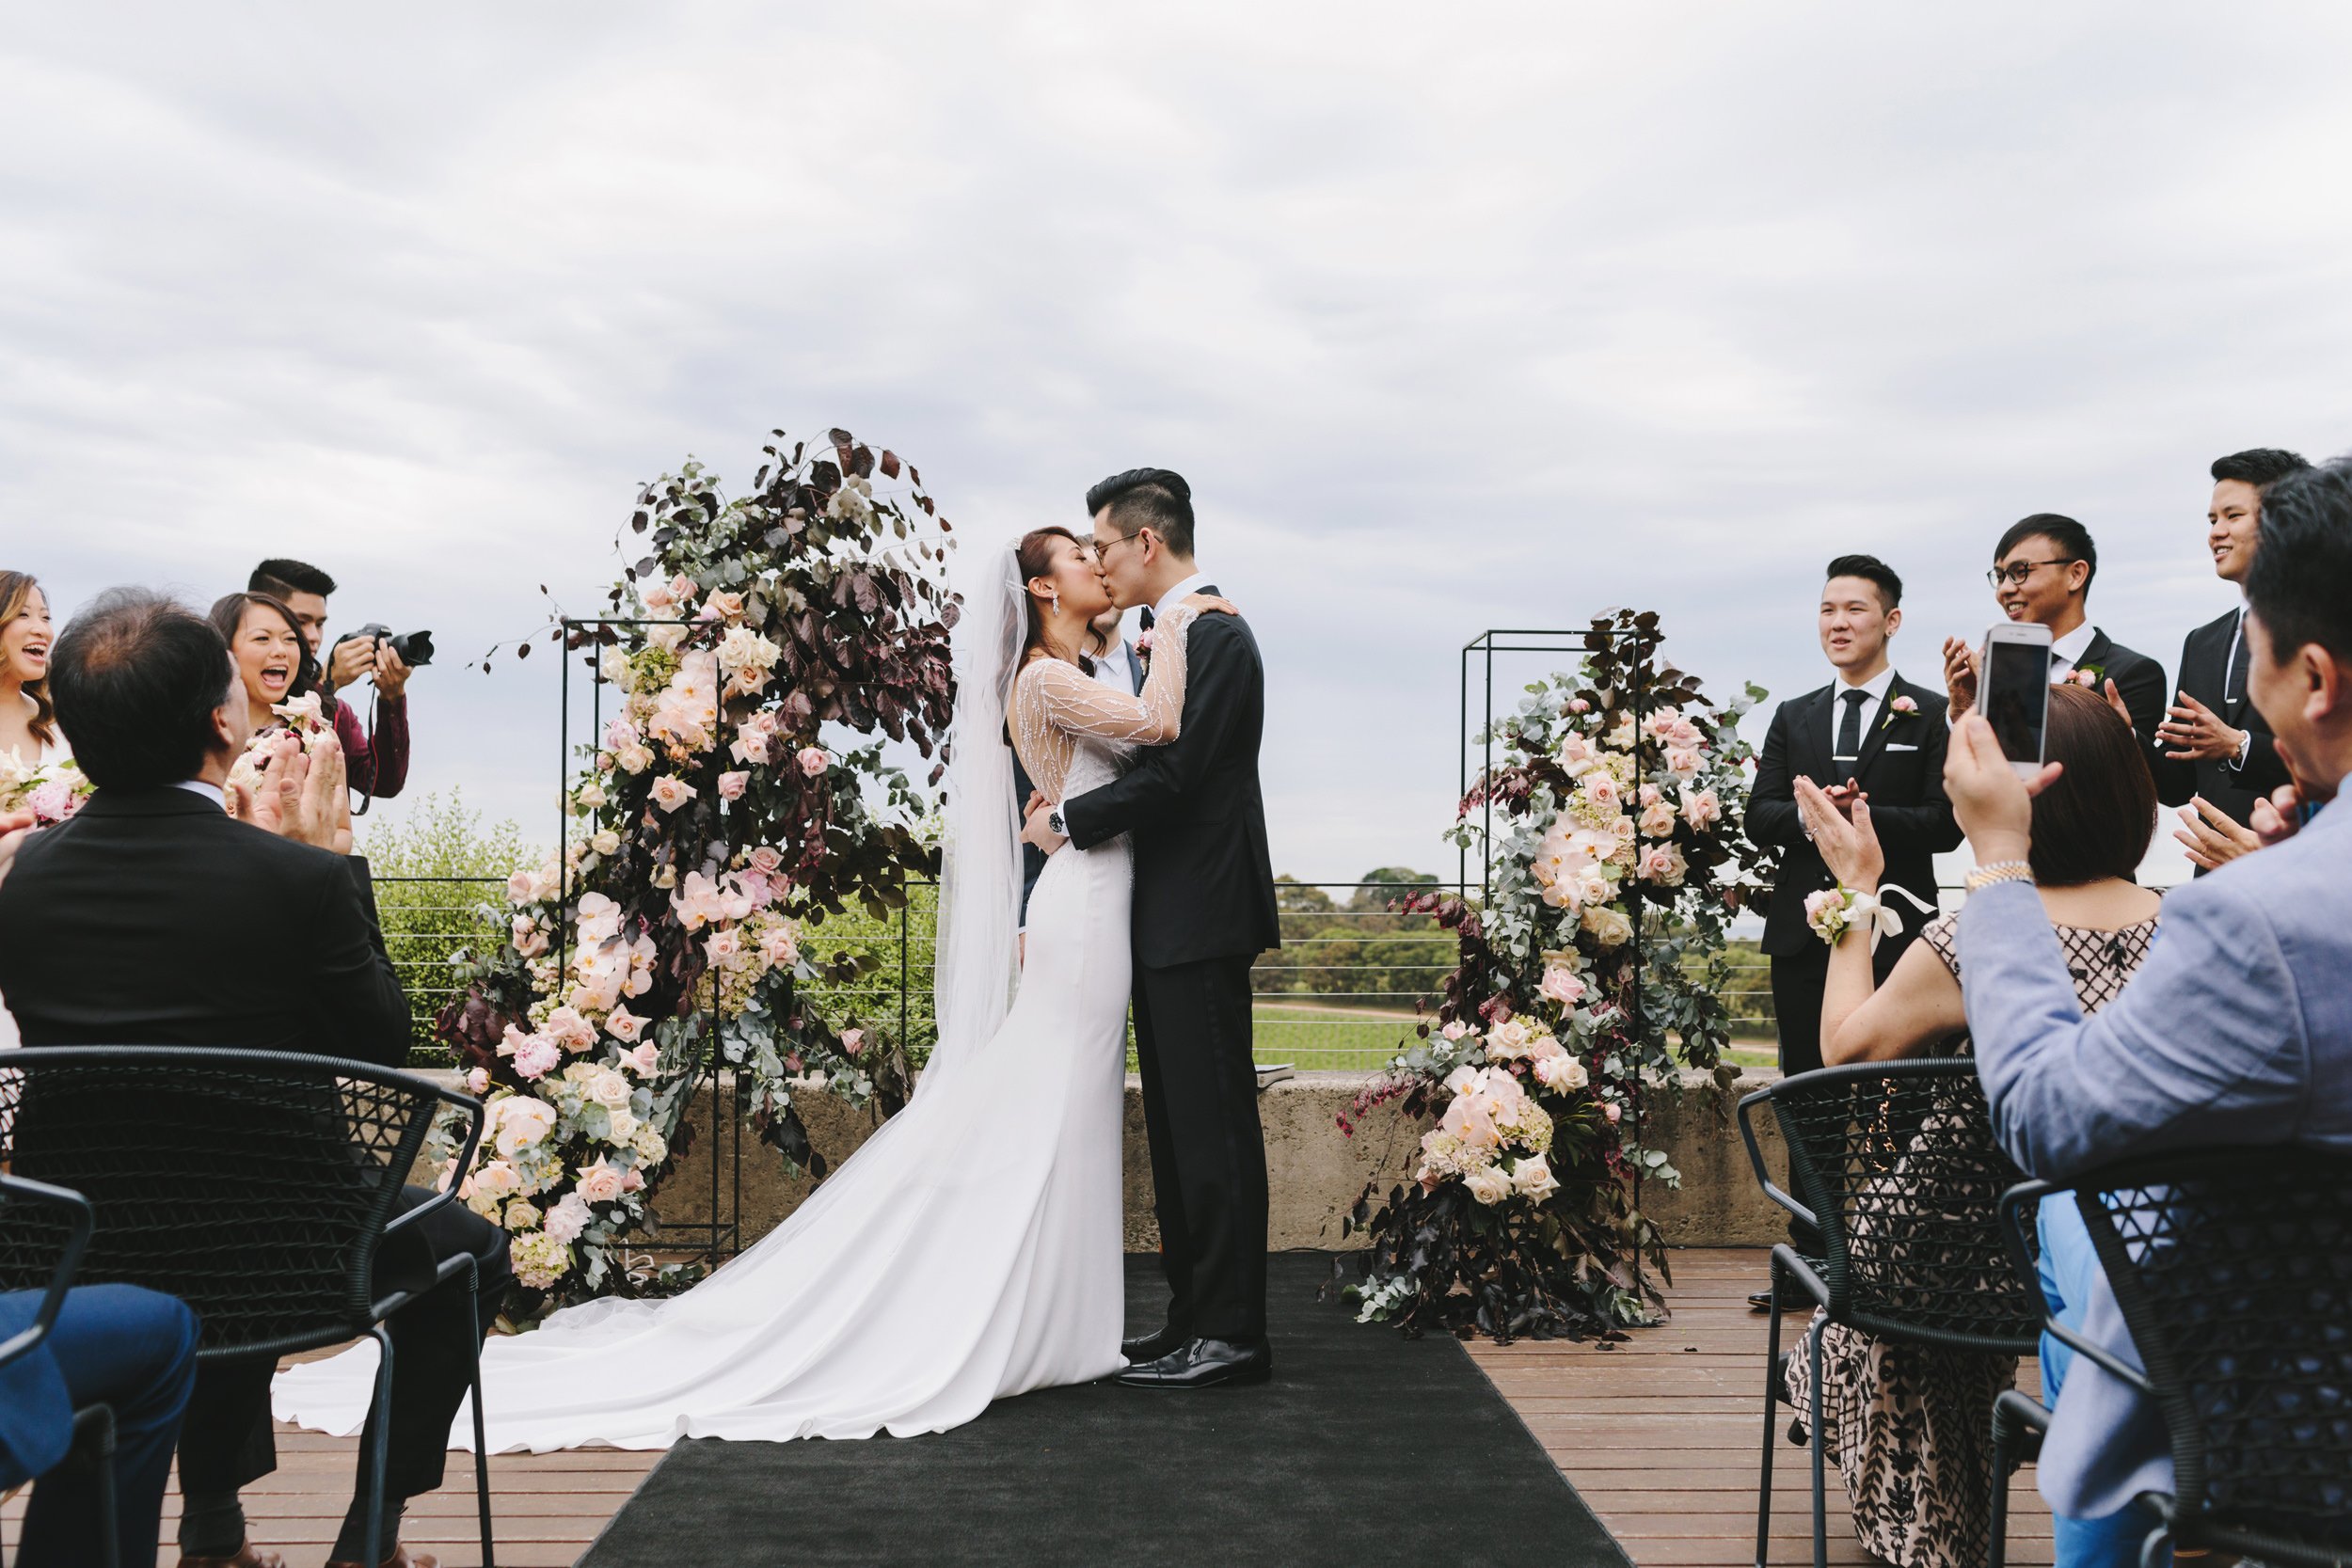 Melbourne Winery Wedding Daryl & Adeline 48.JPG